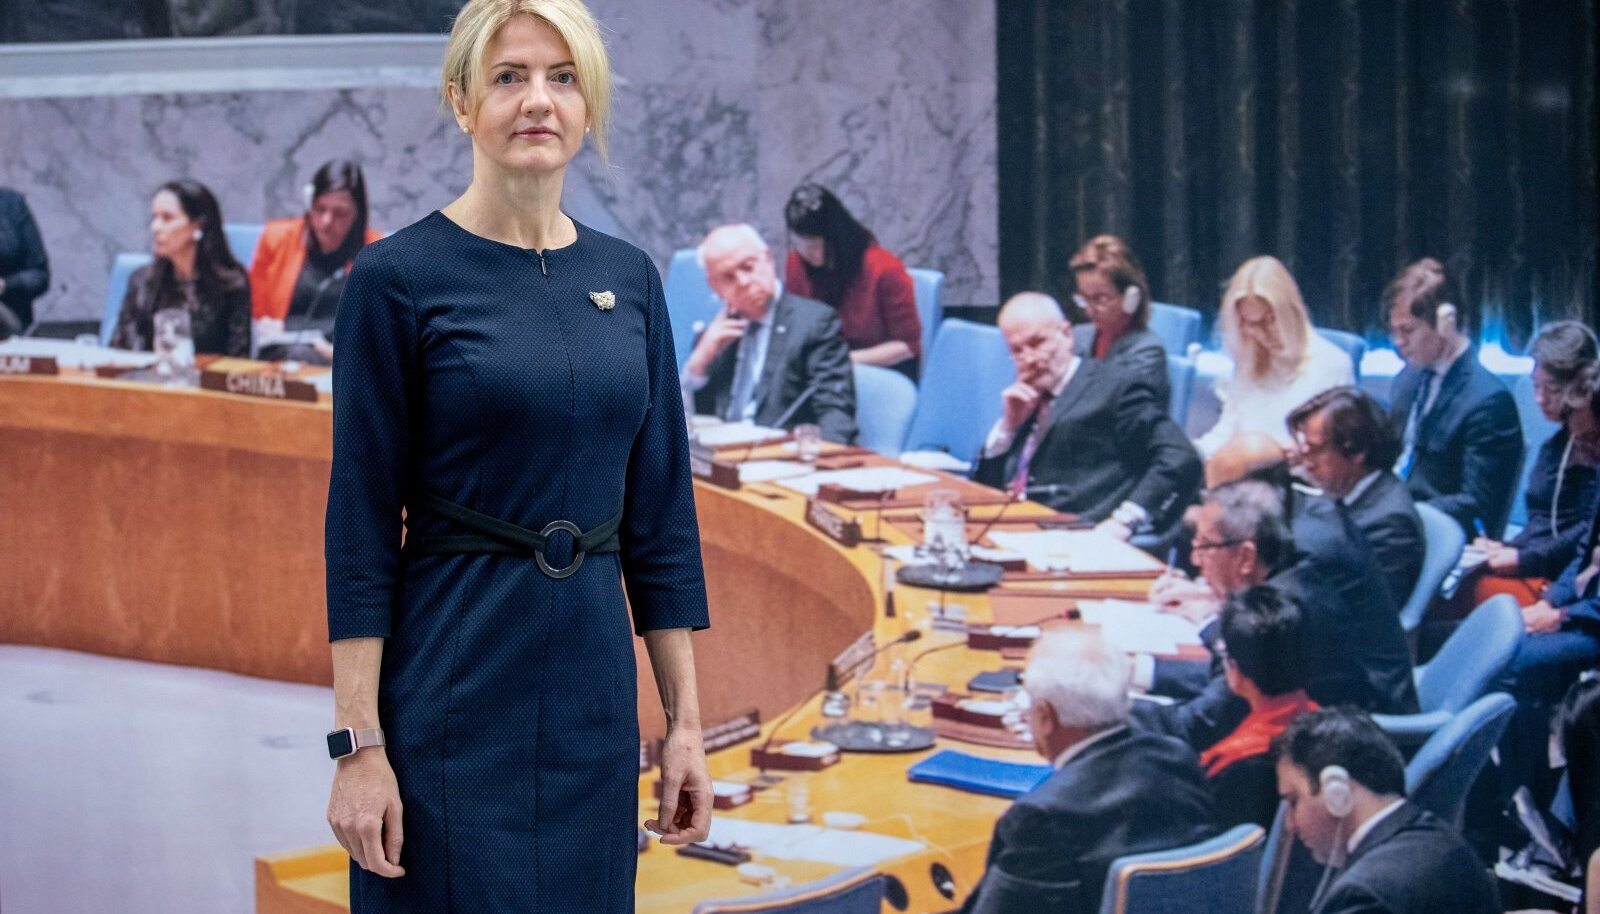 VÄLISMINISTER: Eva-Maria Liimets.